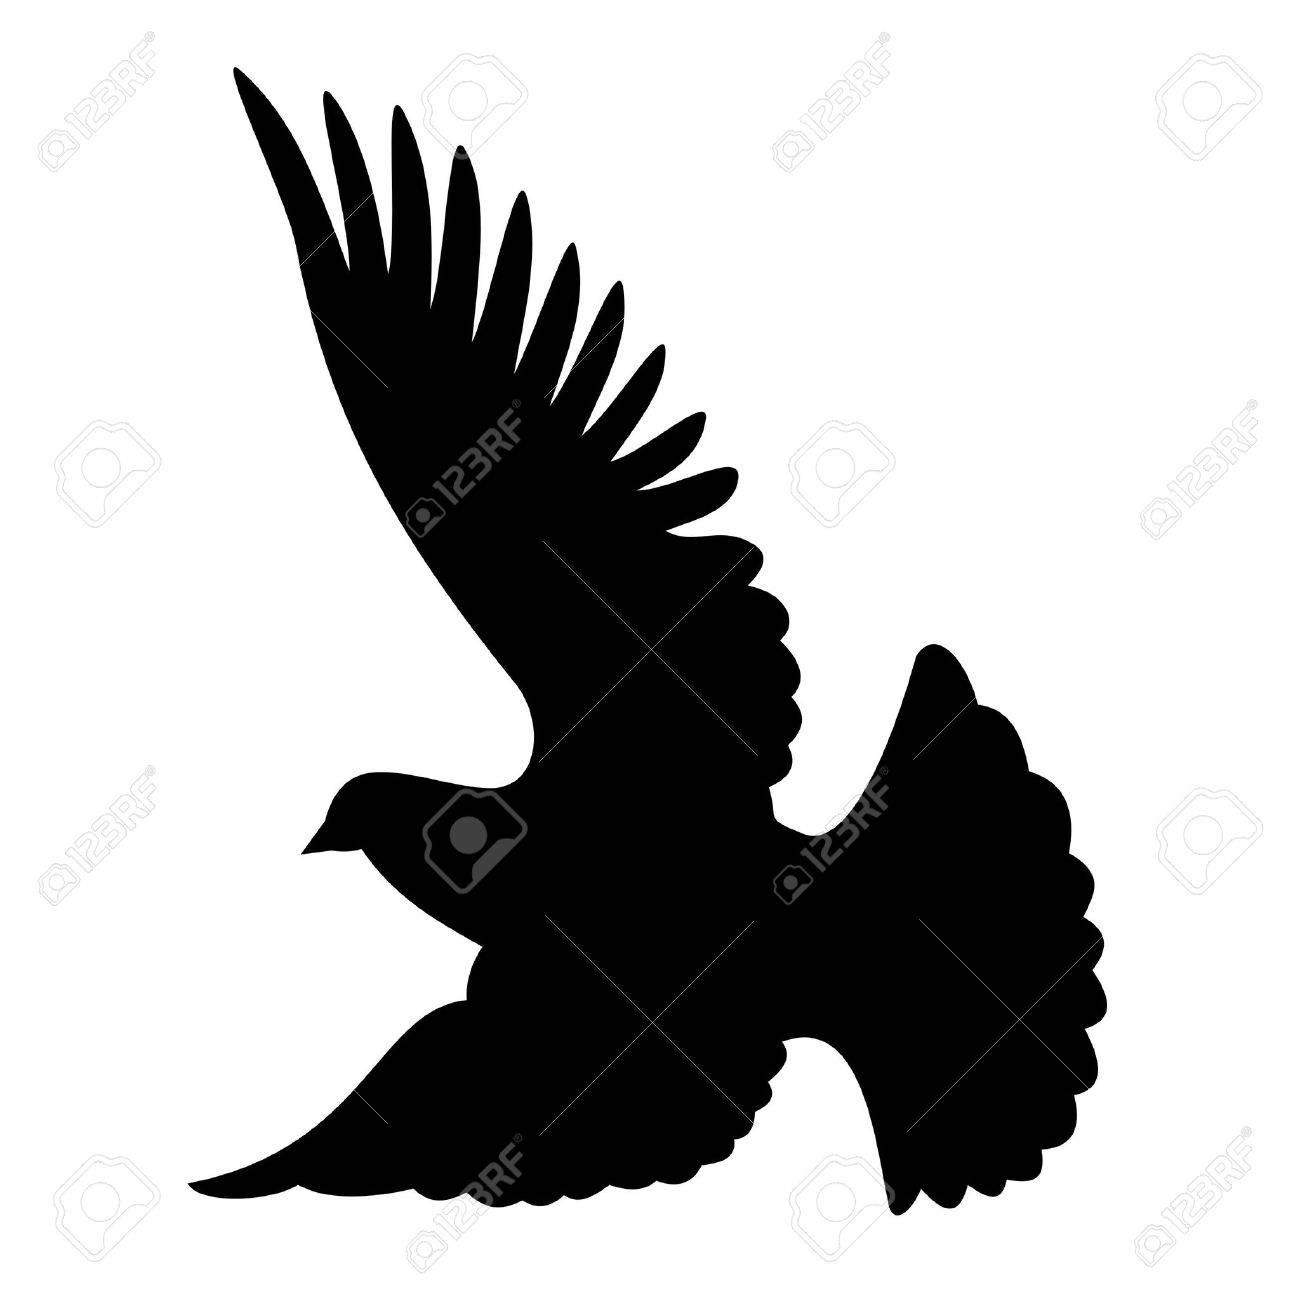 Flying dove silhouette on white background Stock Vector - 2985982